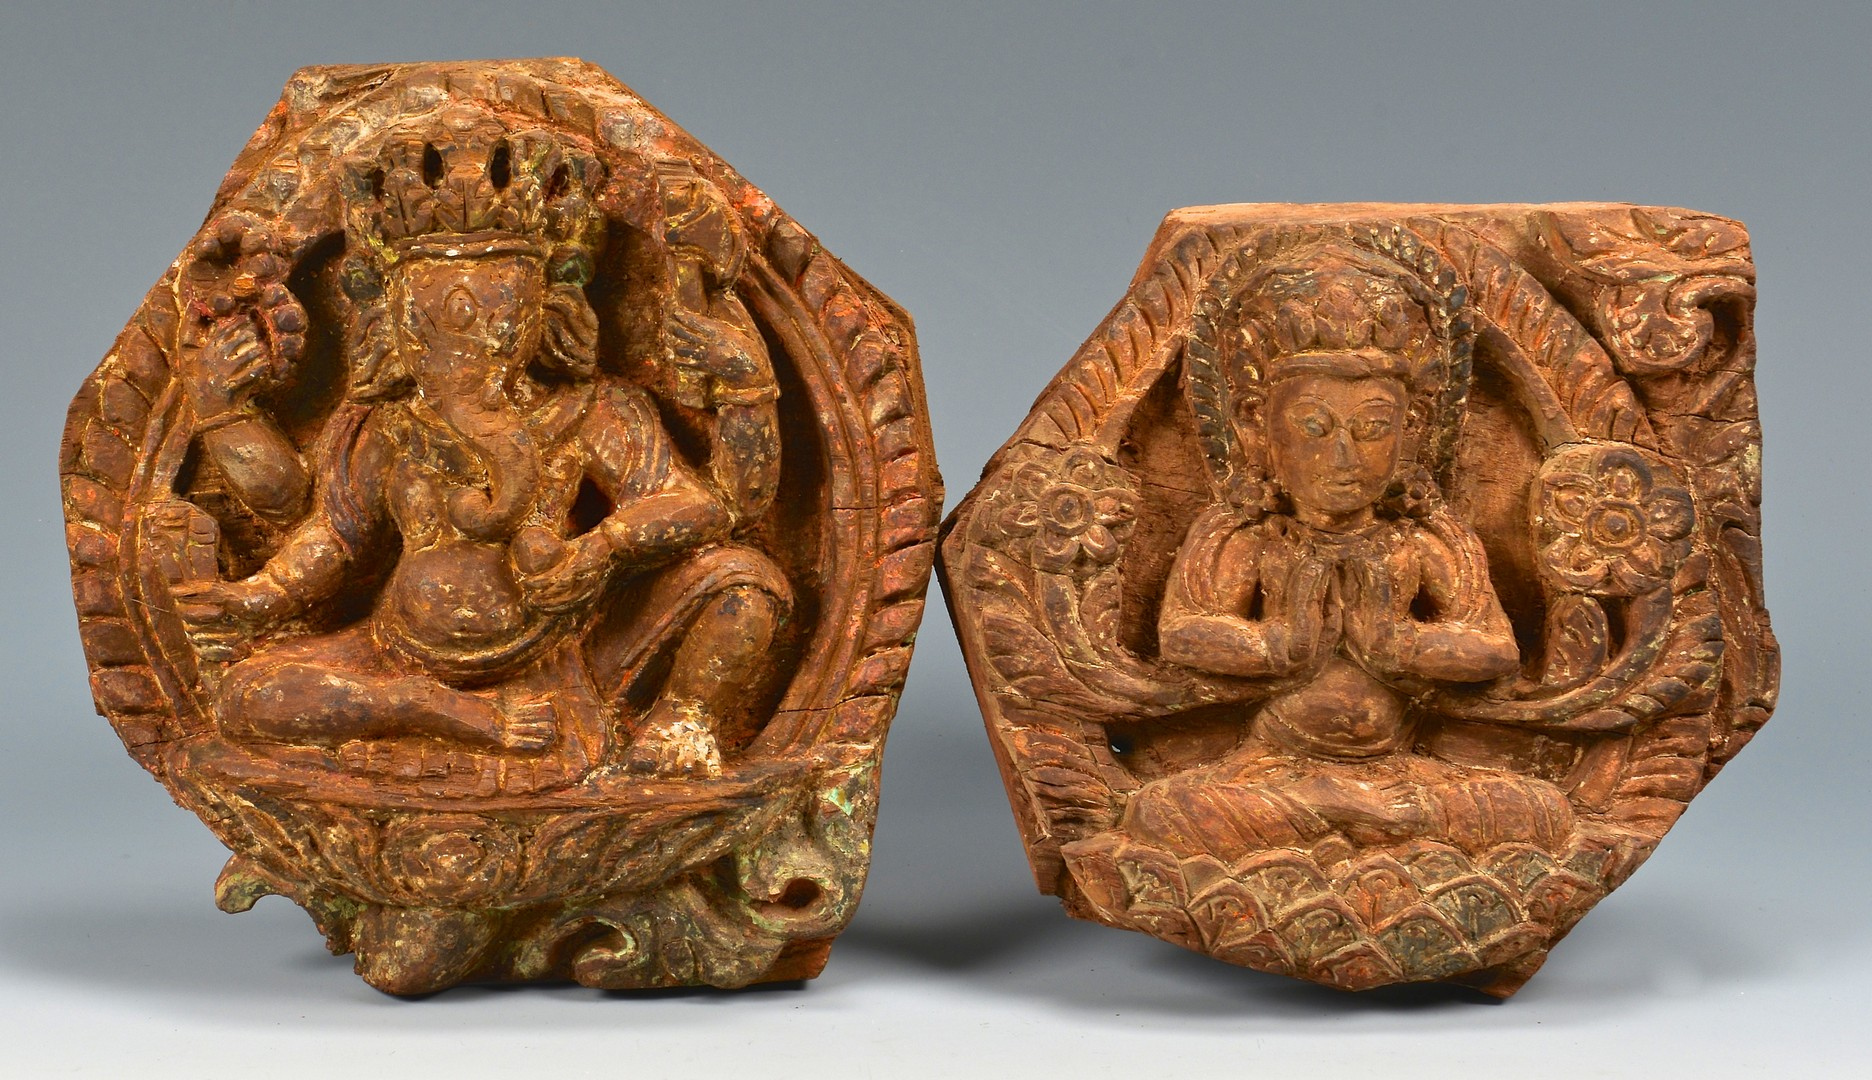 Lot 4010073: 7 Asian / Tibetan Architectural Plaques